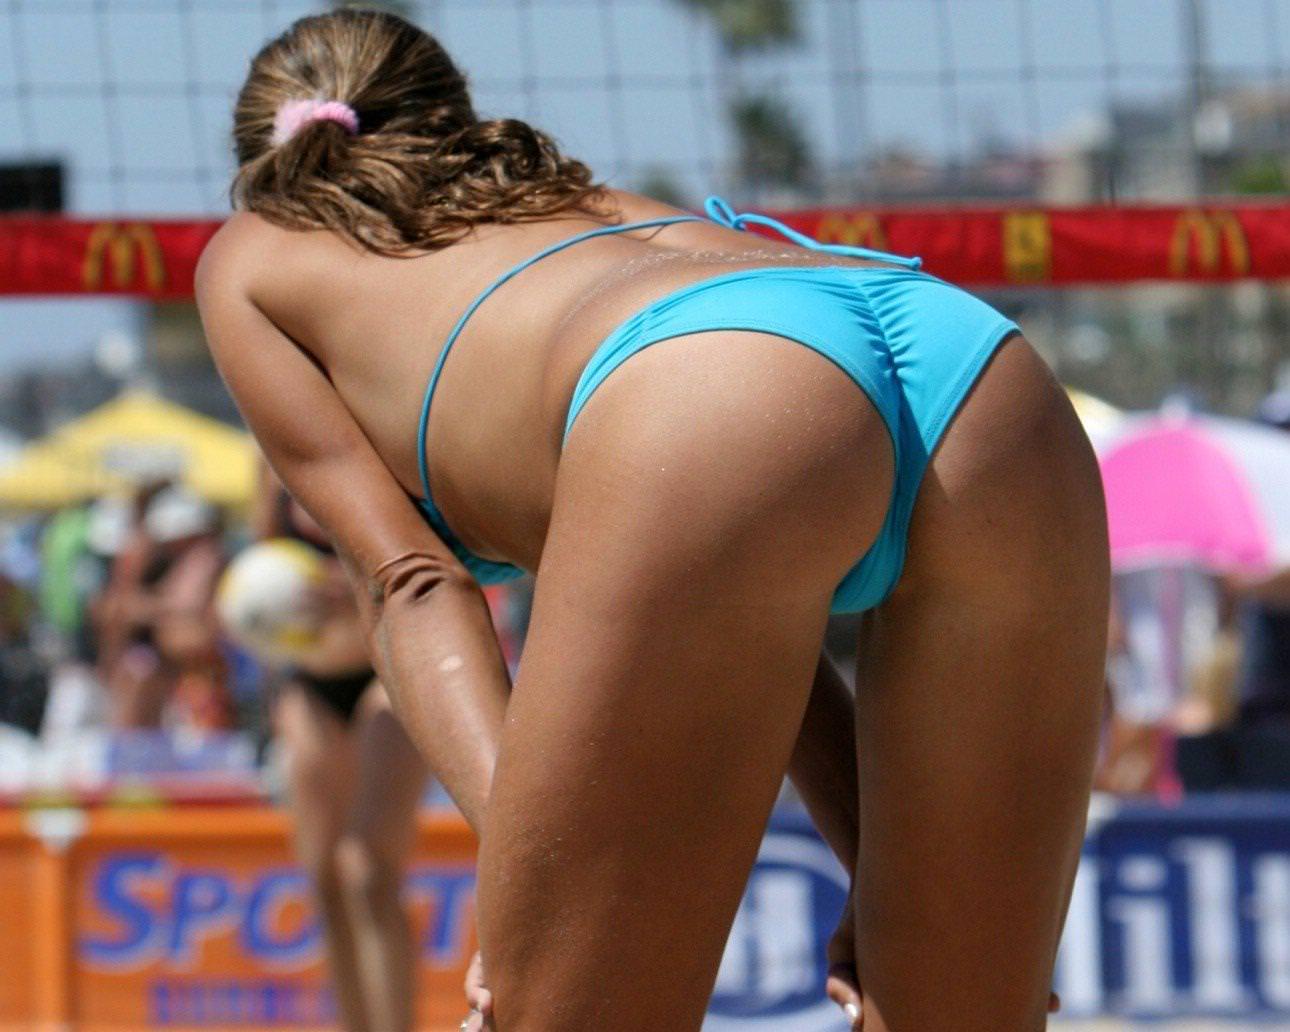 Volleyball porn